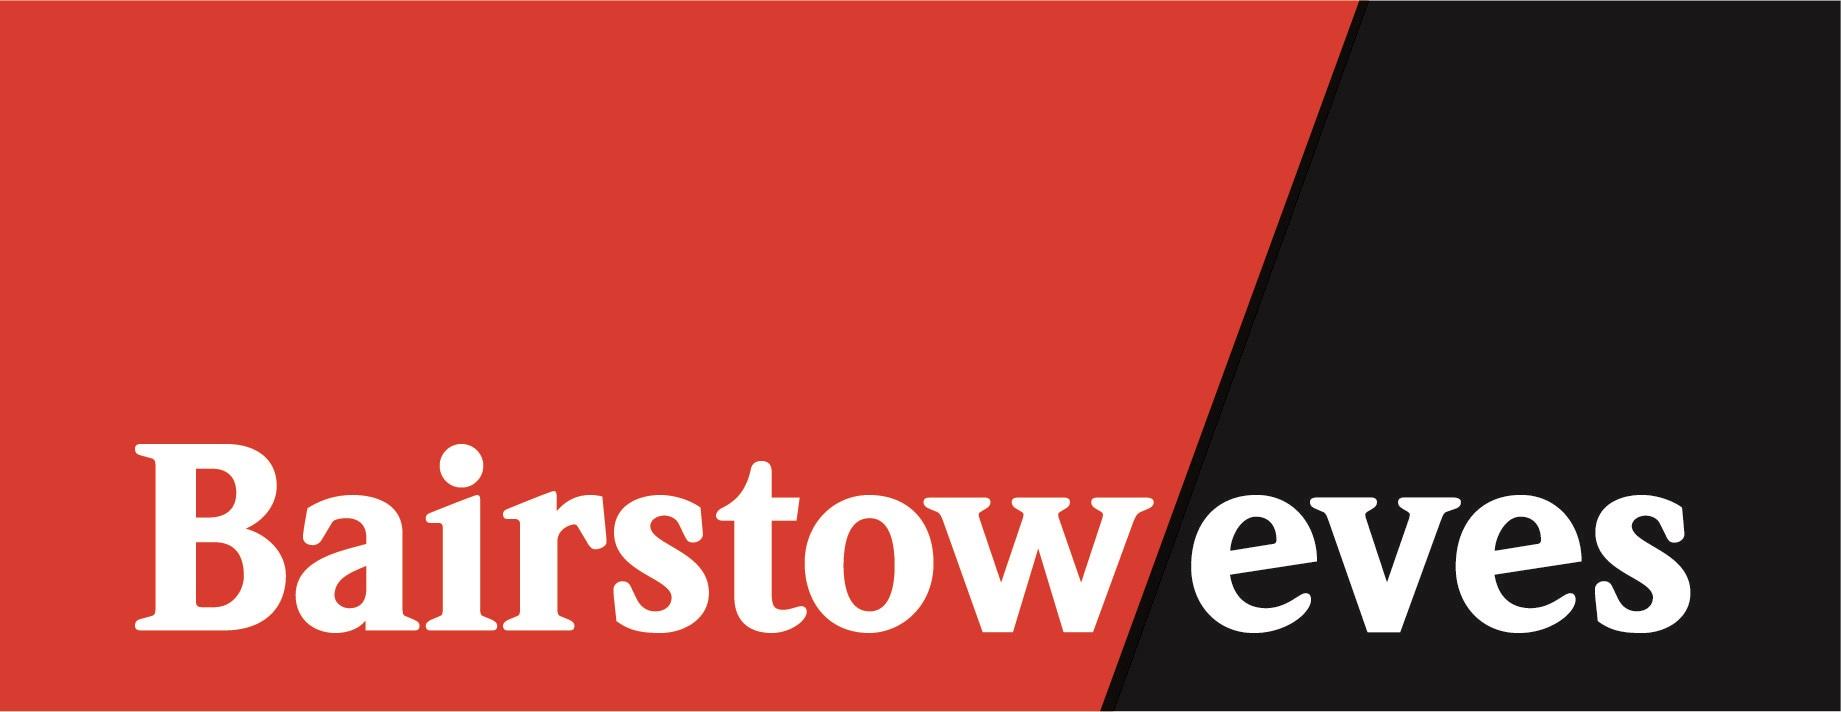 CW - Bairstow Eves - Sittingbourne